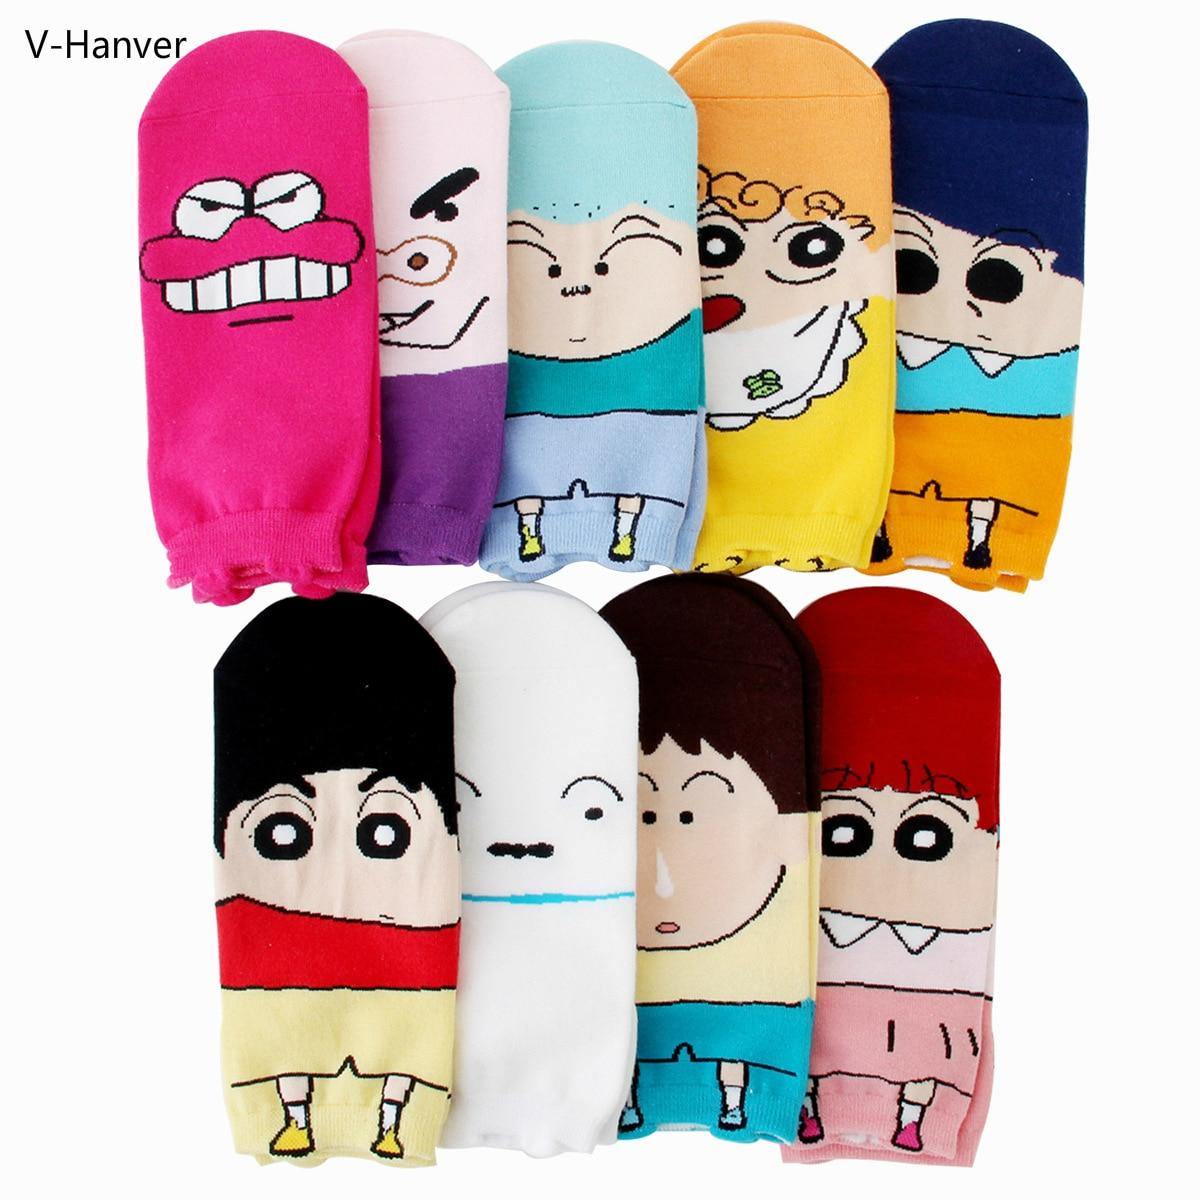 New Cute Cartoon Dog Pig 3D Printing   Socks   Funny   Socks   Unisex Sox Crayon Shin Chan Femmes Men Male Short   Sock   Colorful Breathabl